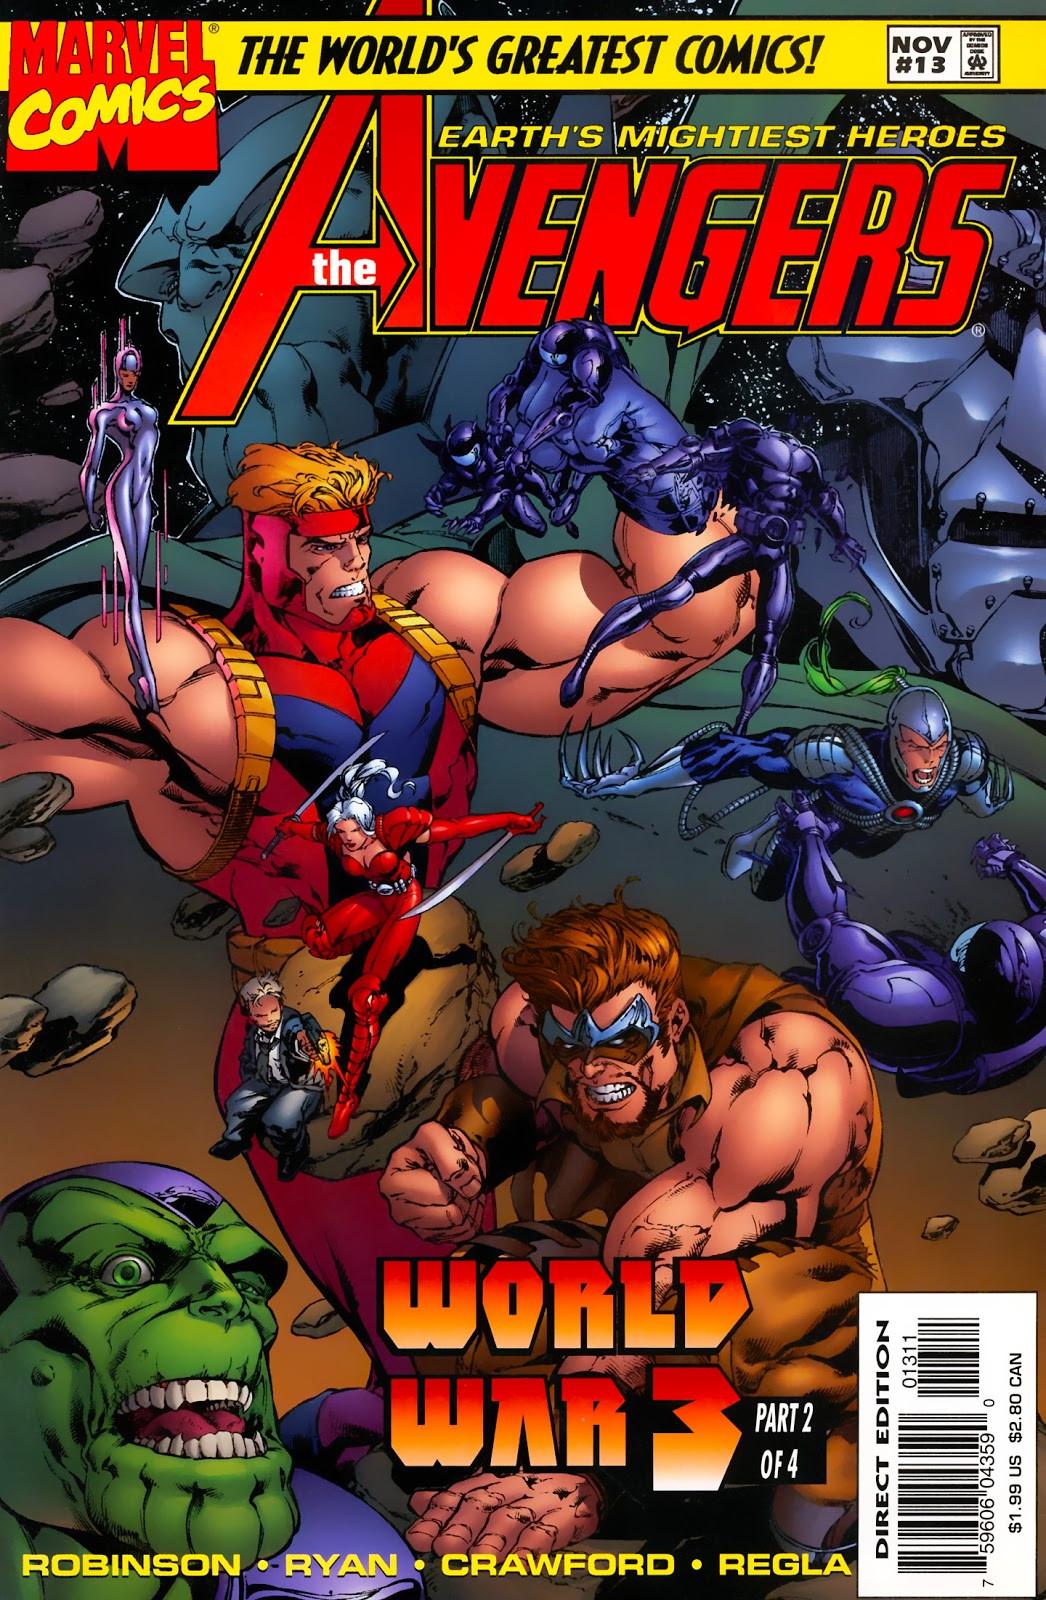 Avengers Vol 2 13